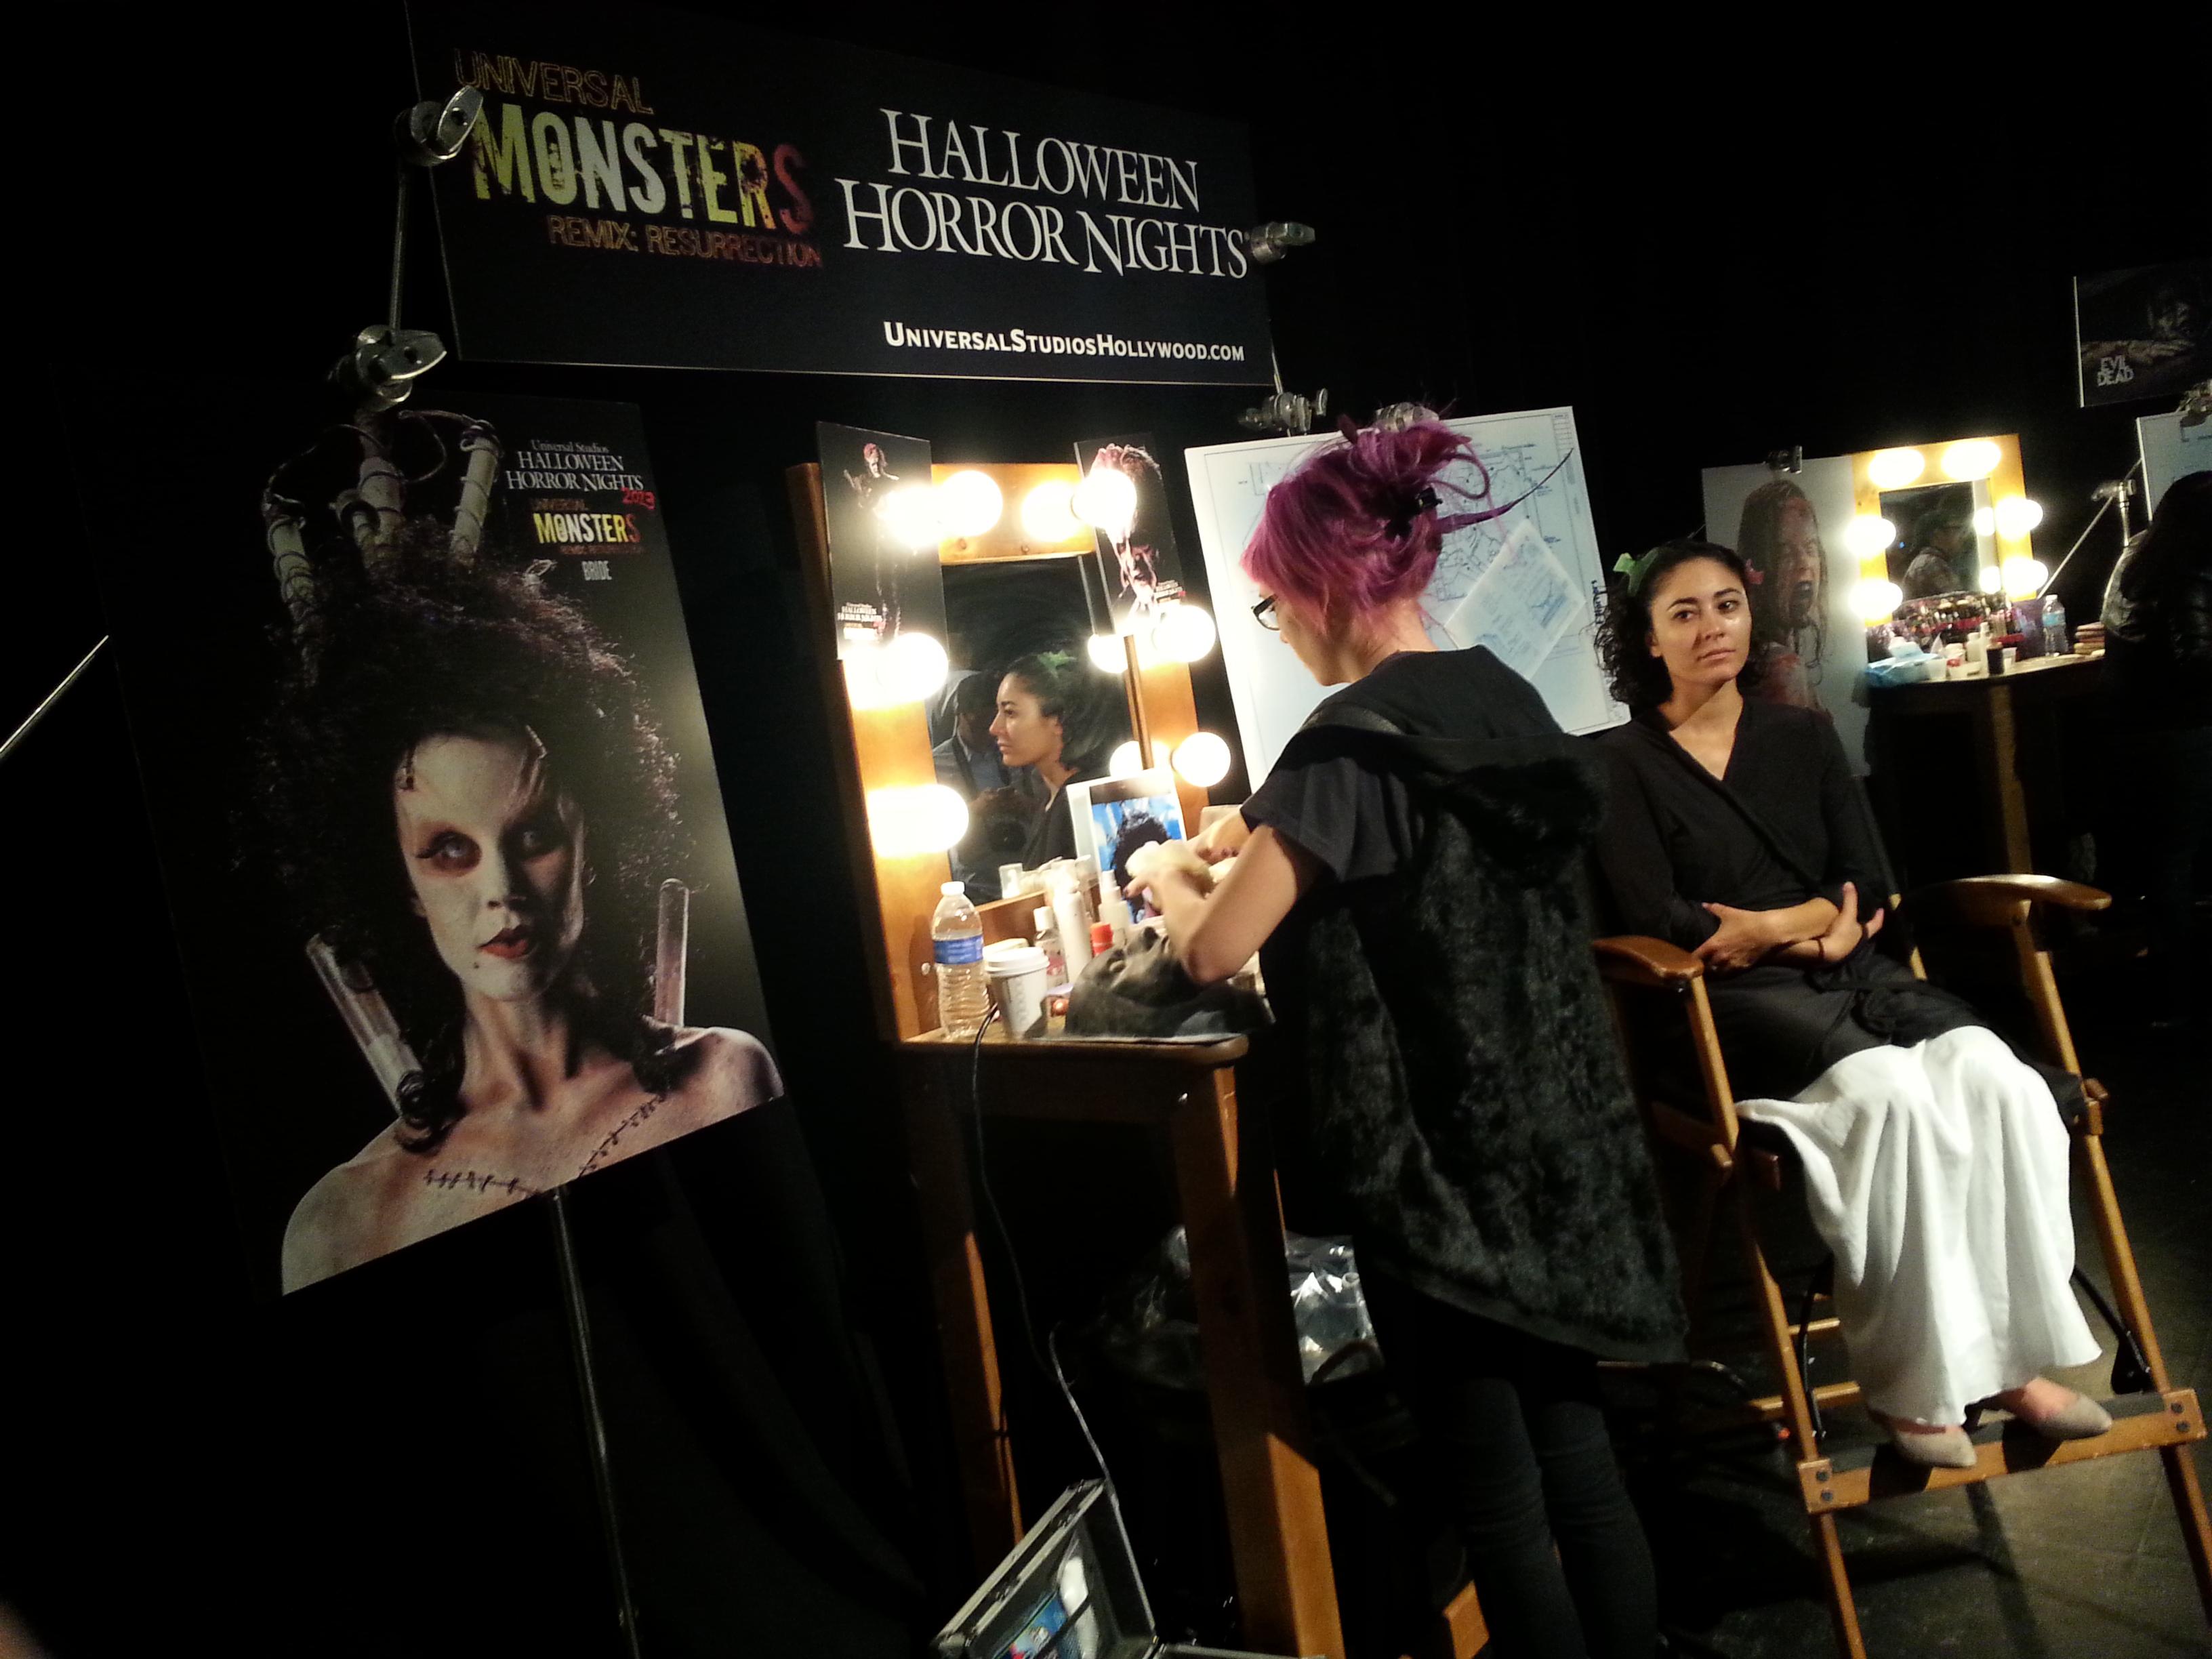 Behind the scenes halloween horror nights hollywood 2013 - Busch gardens halloween horror nights ...